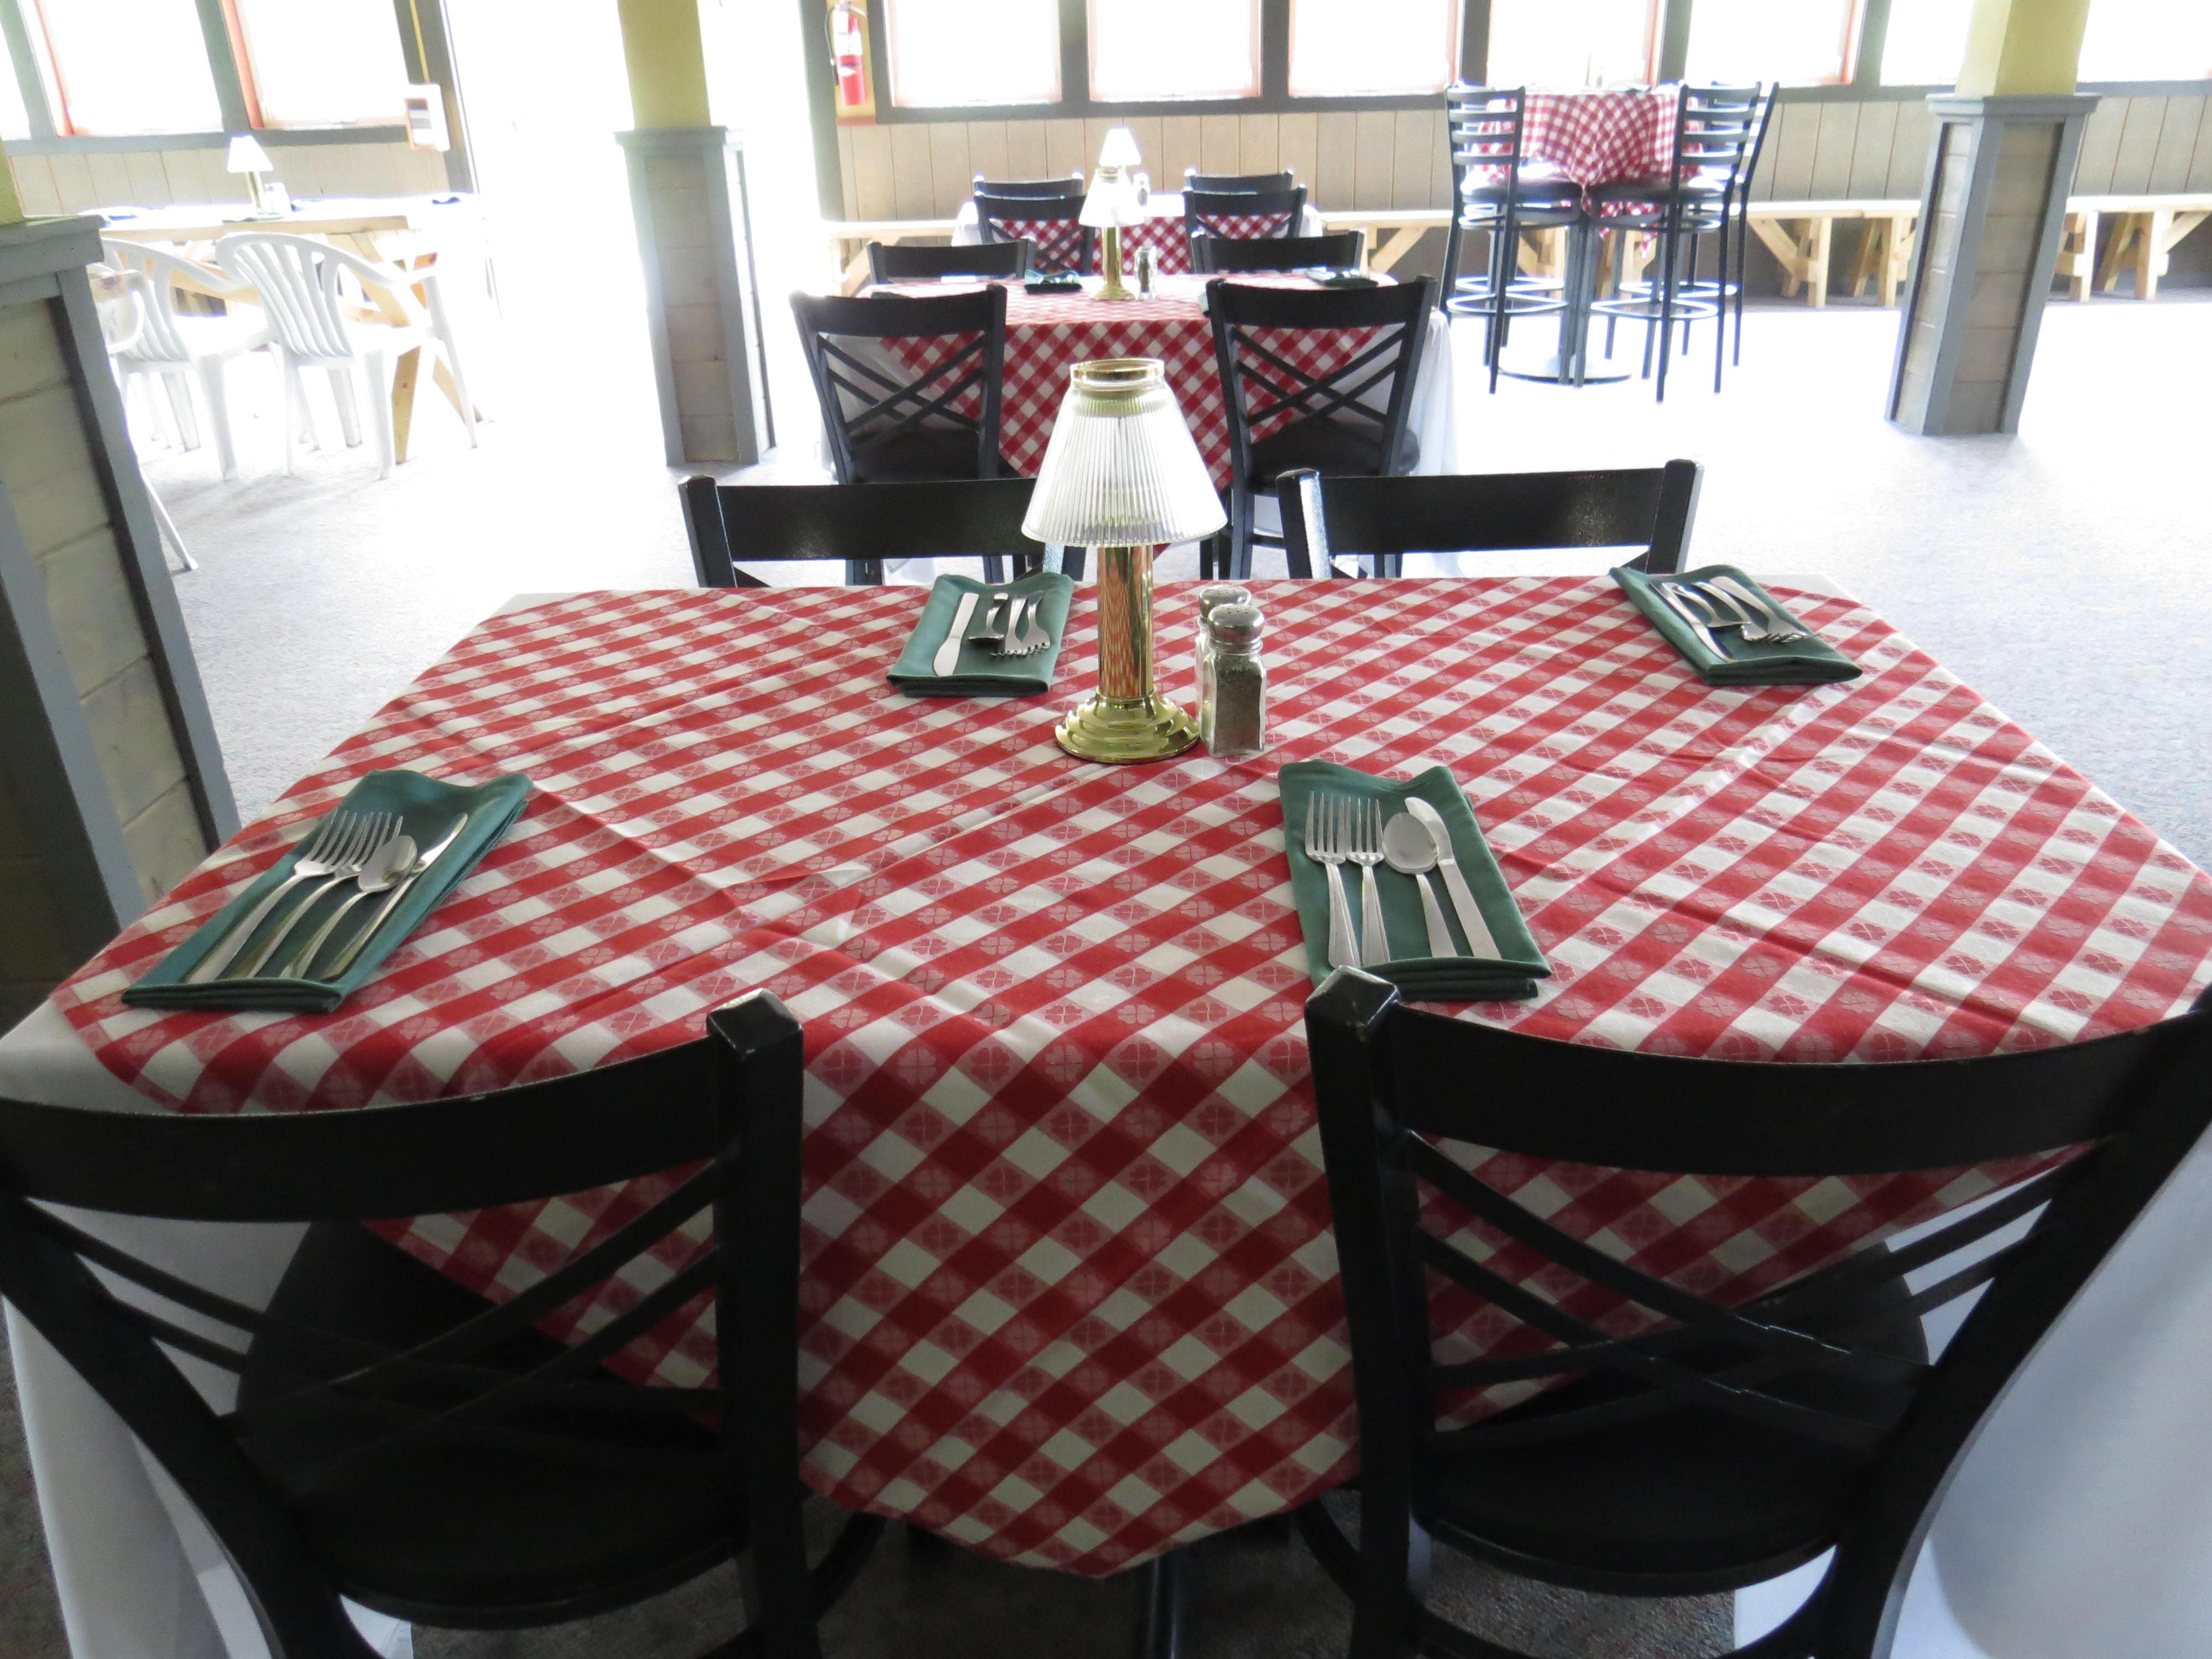 tables set for Italian Night